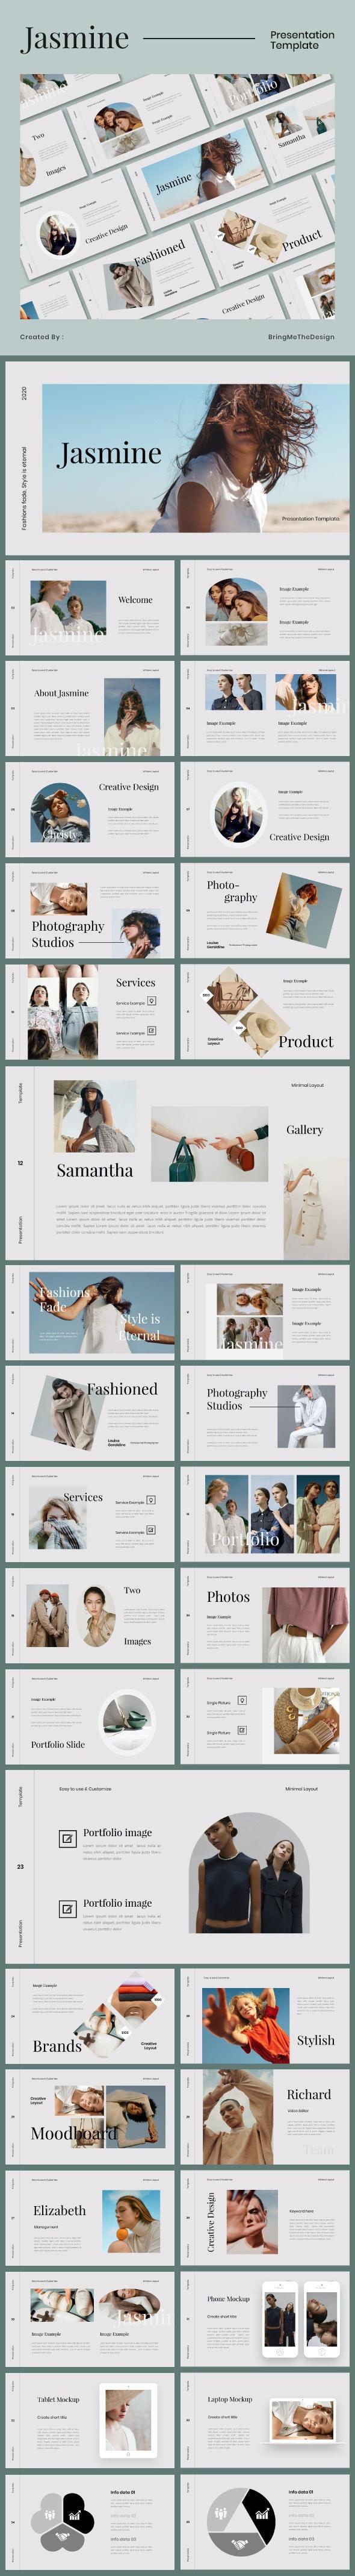 Jasmine Fashion PowerPoint - Creative PowerPoint Templates